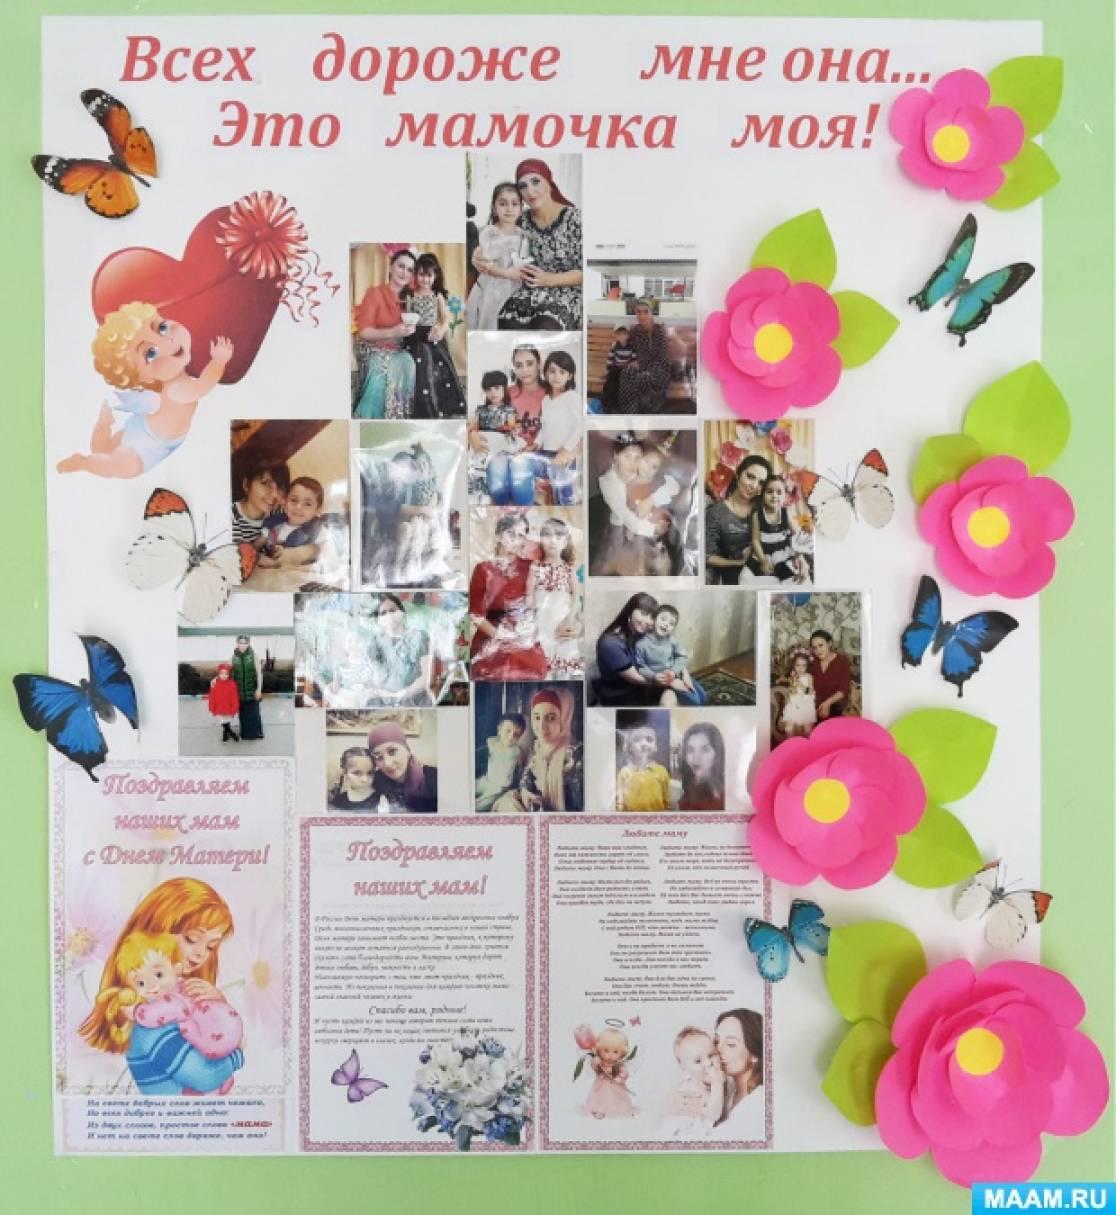 Плакат про маму сухого трения